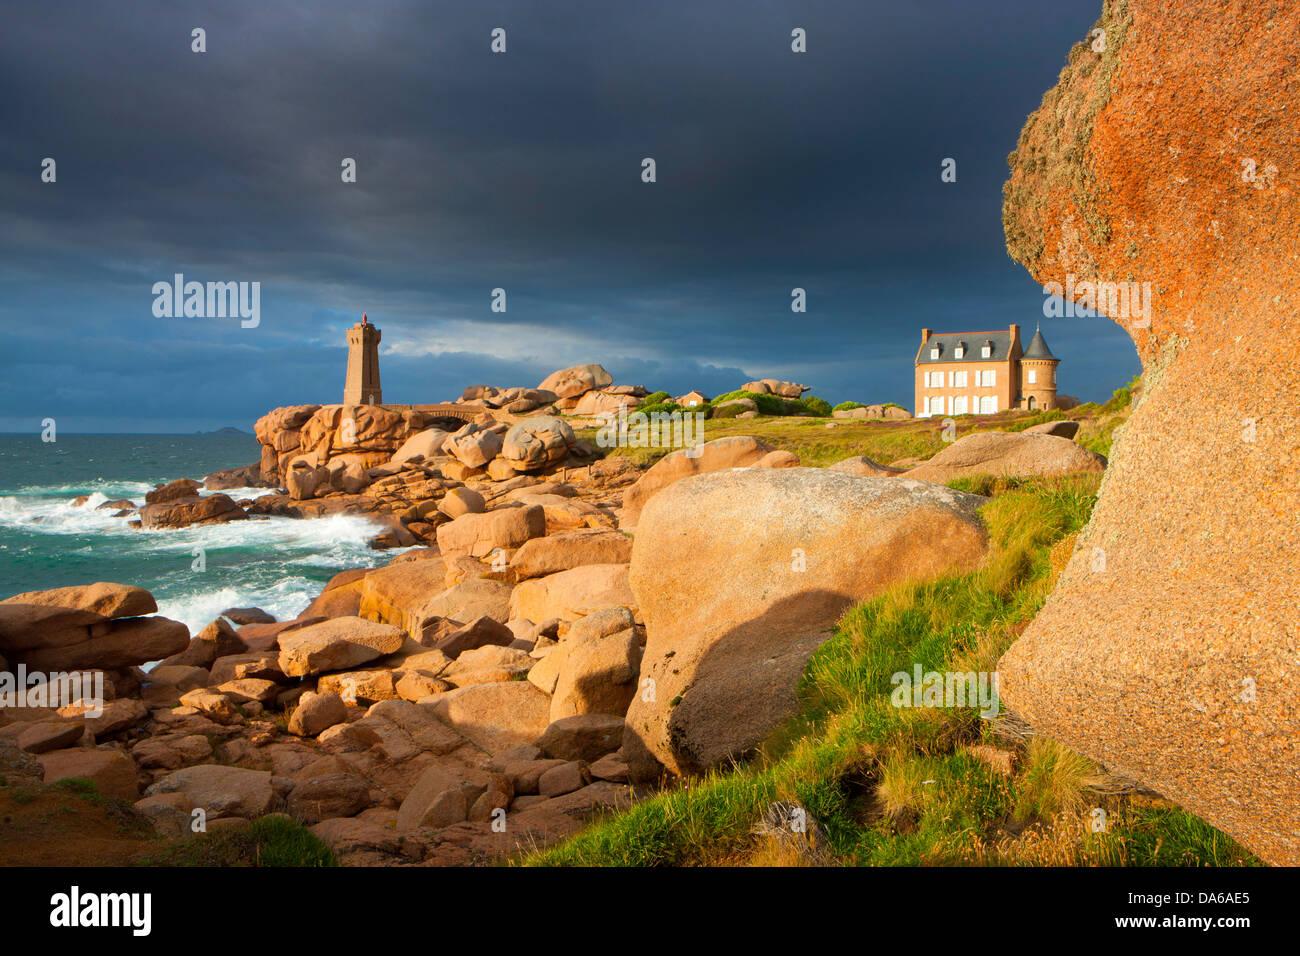 Ploumanach, France, Europe, Brittany, department Côte d'Armor, Côte de granite rose, granite rock, - Stock Image